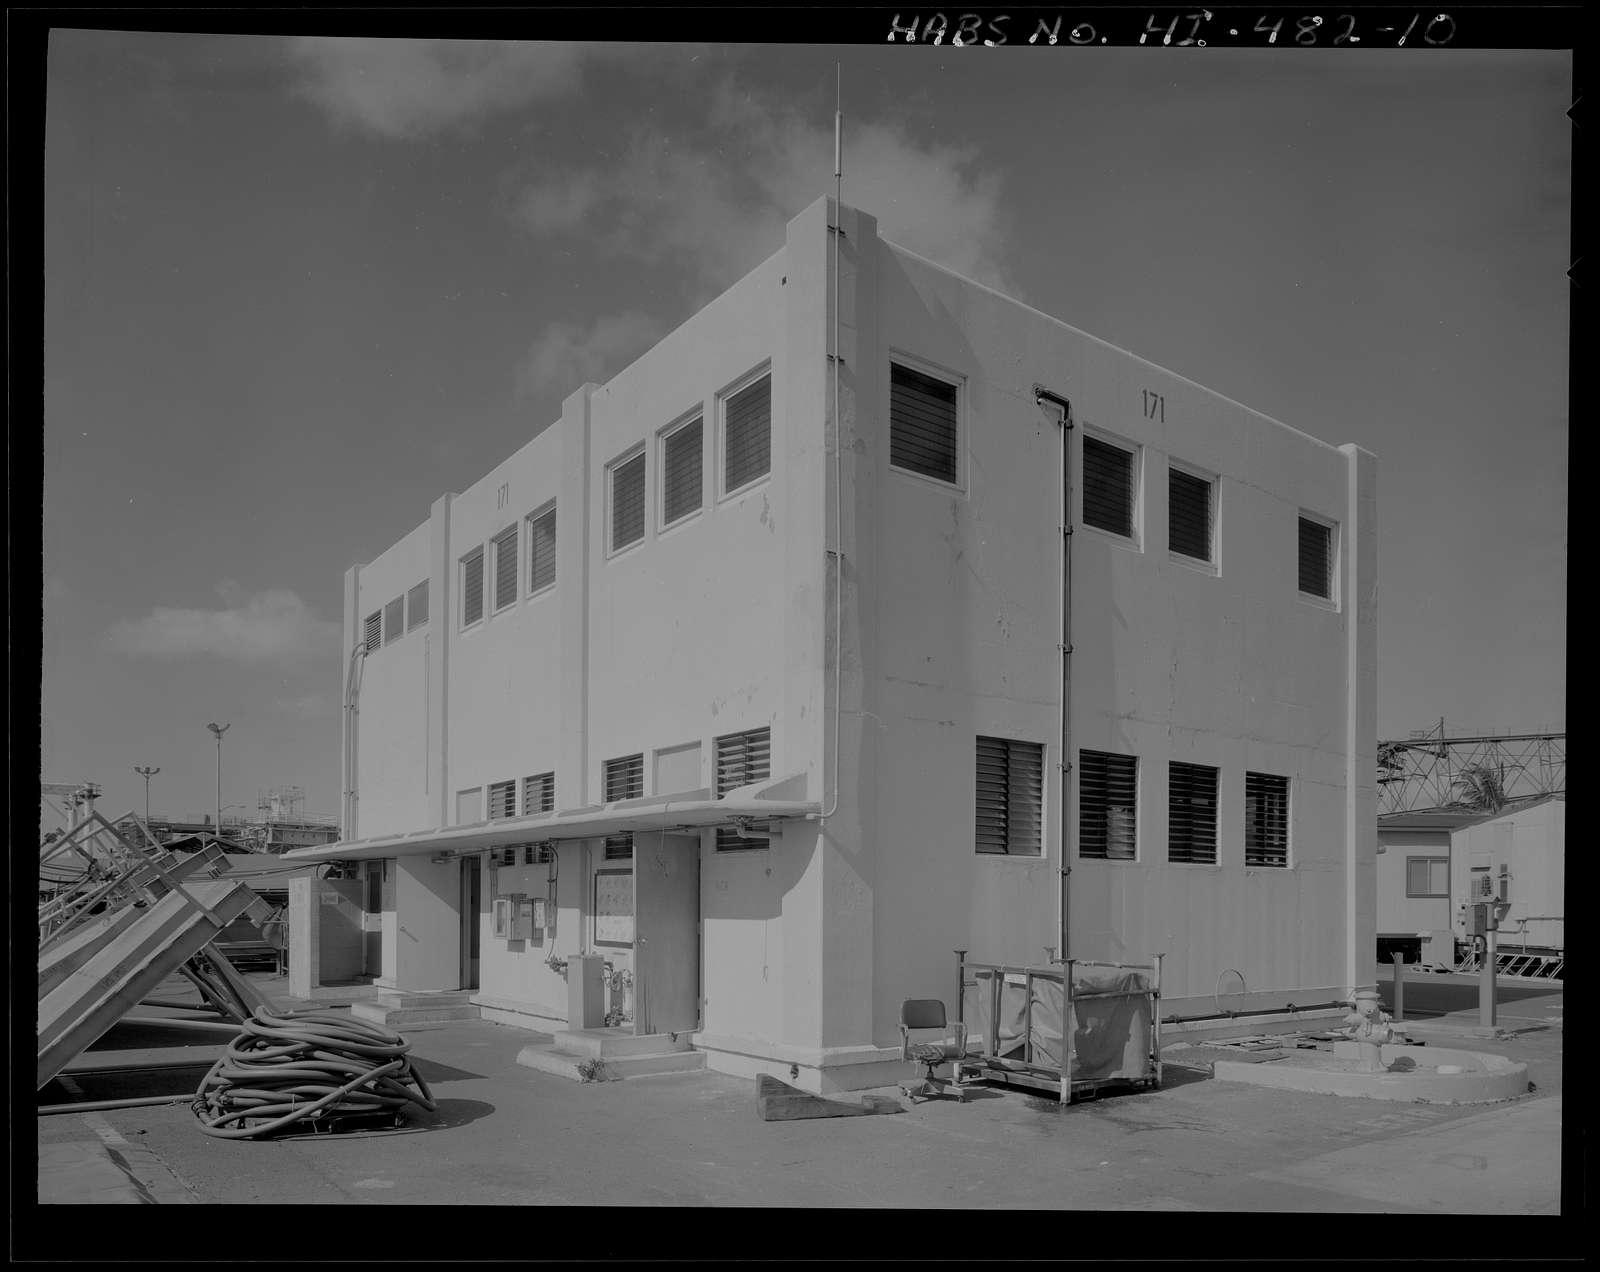 U.S. Naval Base, Pearl Harbor, Latrine Dry Dock No. 2 & Latrine Dry Dock No.3, Near Avenue G adjacent to Dry Dock No. 2 & Dry Dock No. 3, Pearl City, Honolulu County, HI